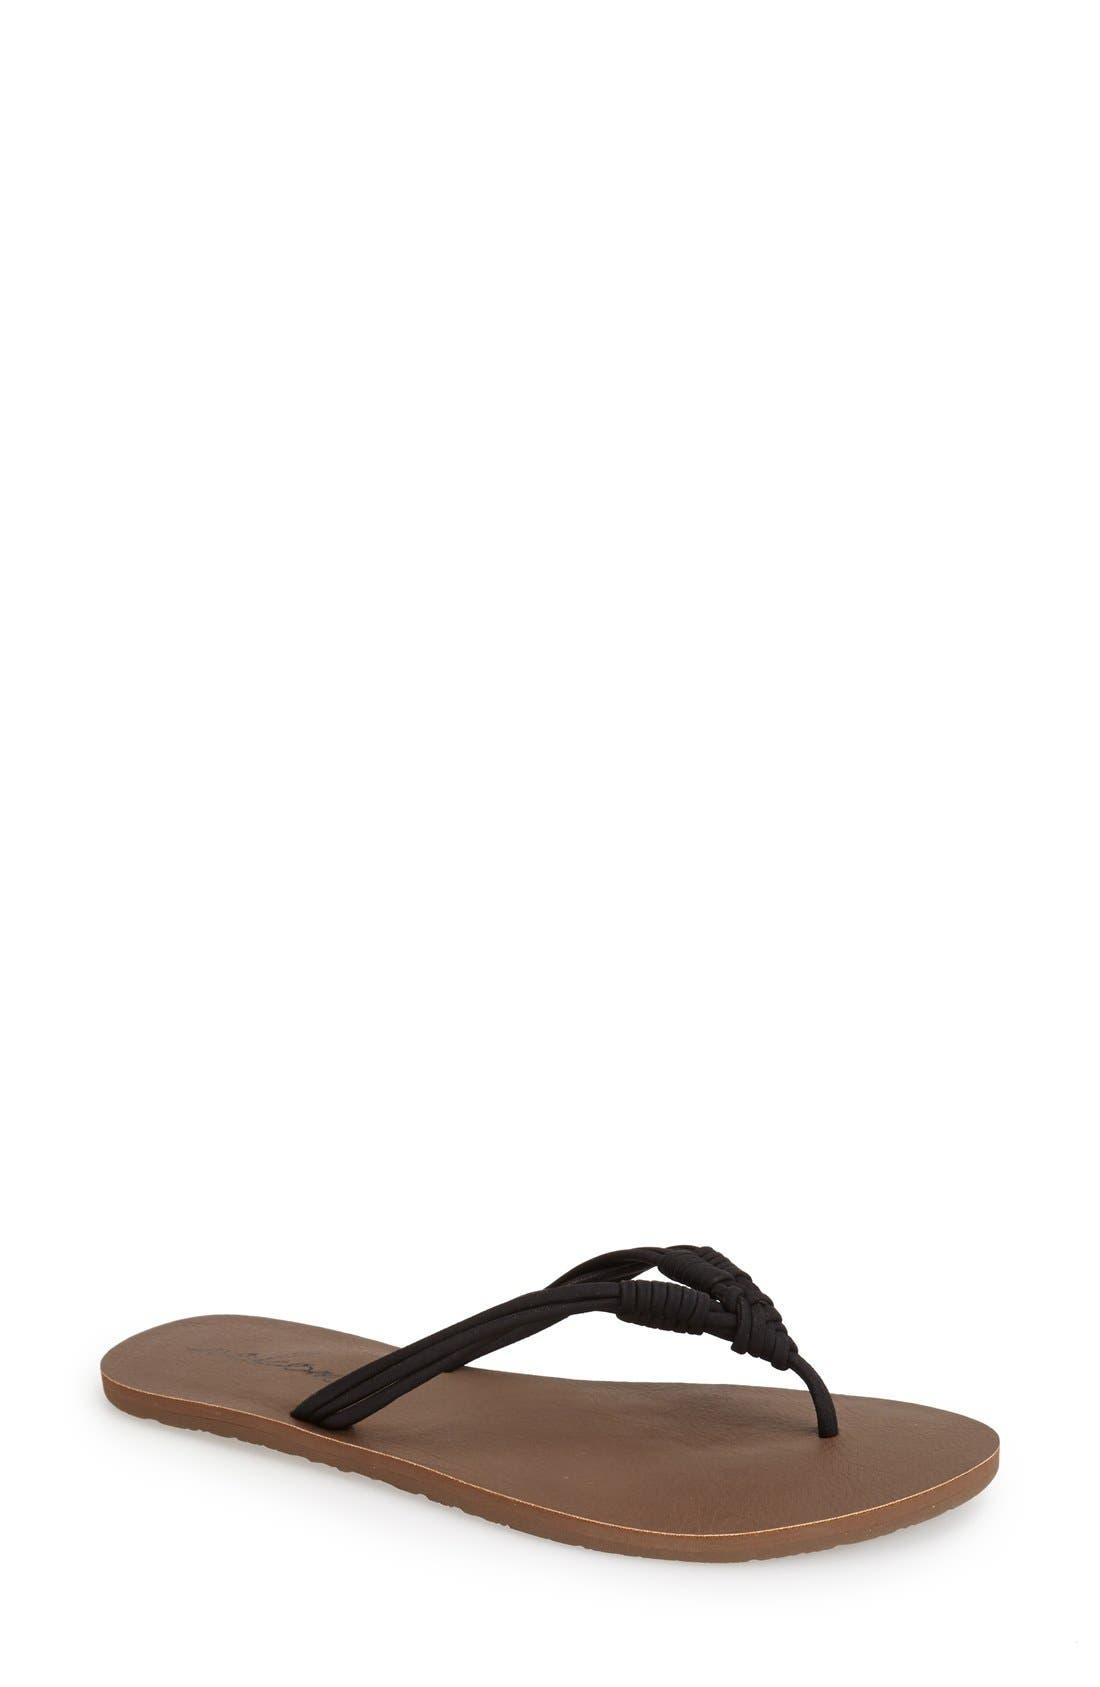 'Have Fun' Thong Sandal, Main, color, 001